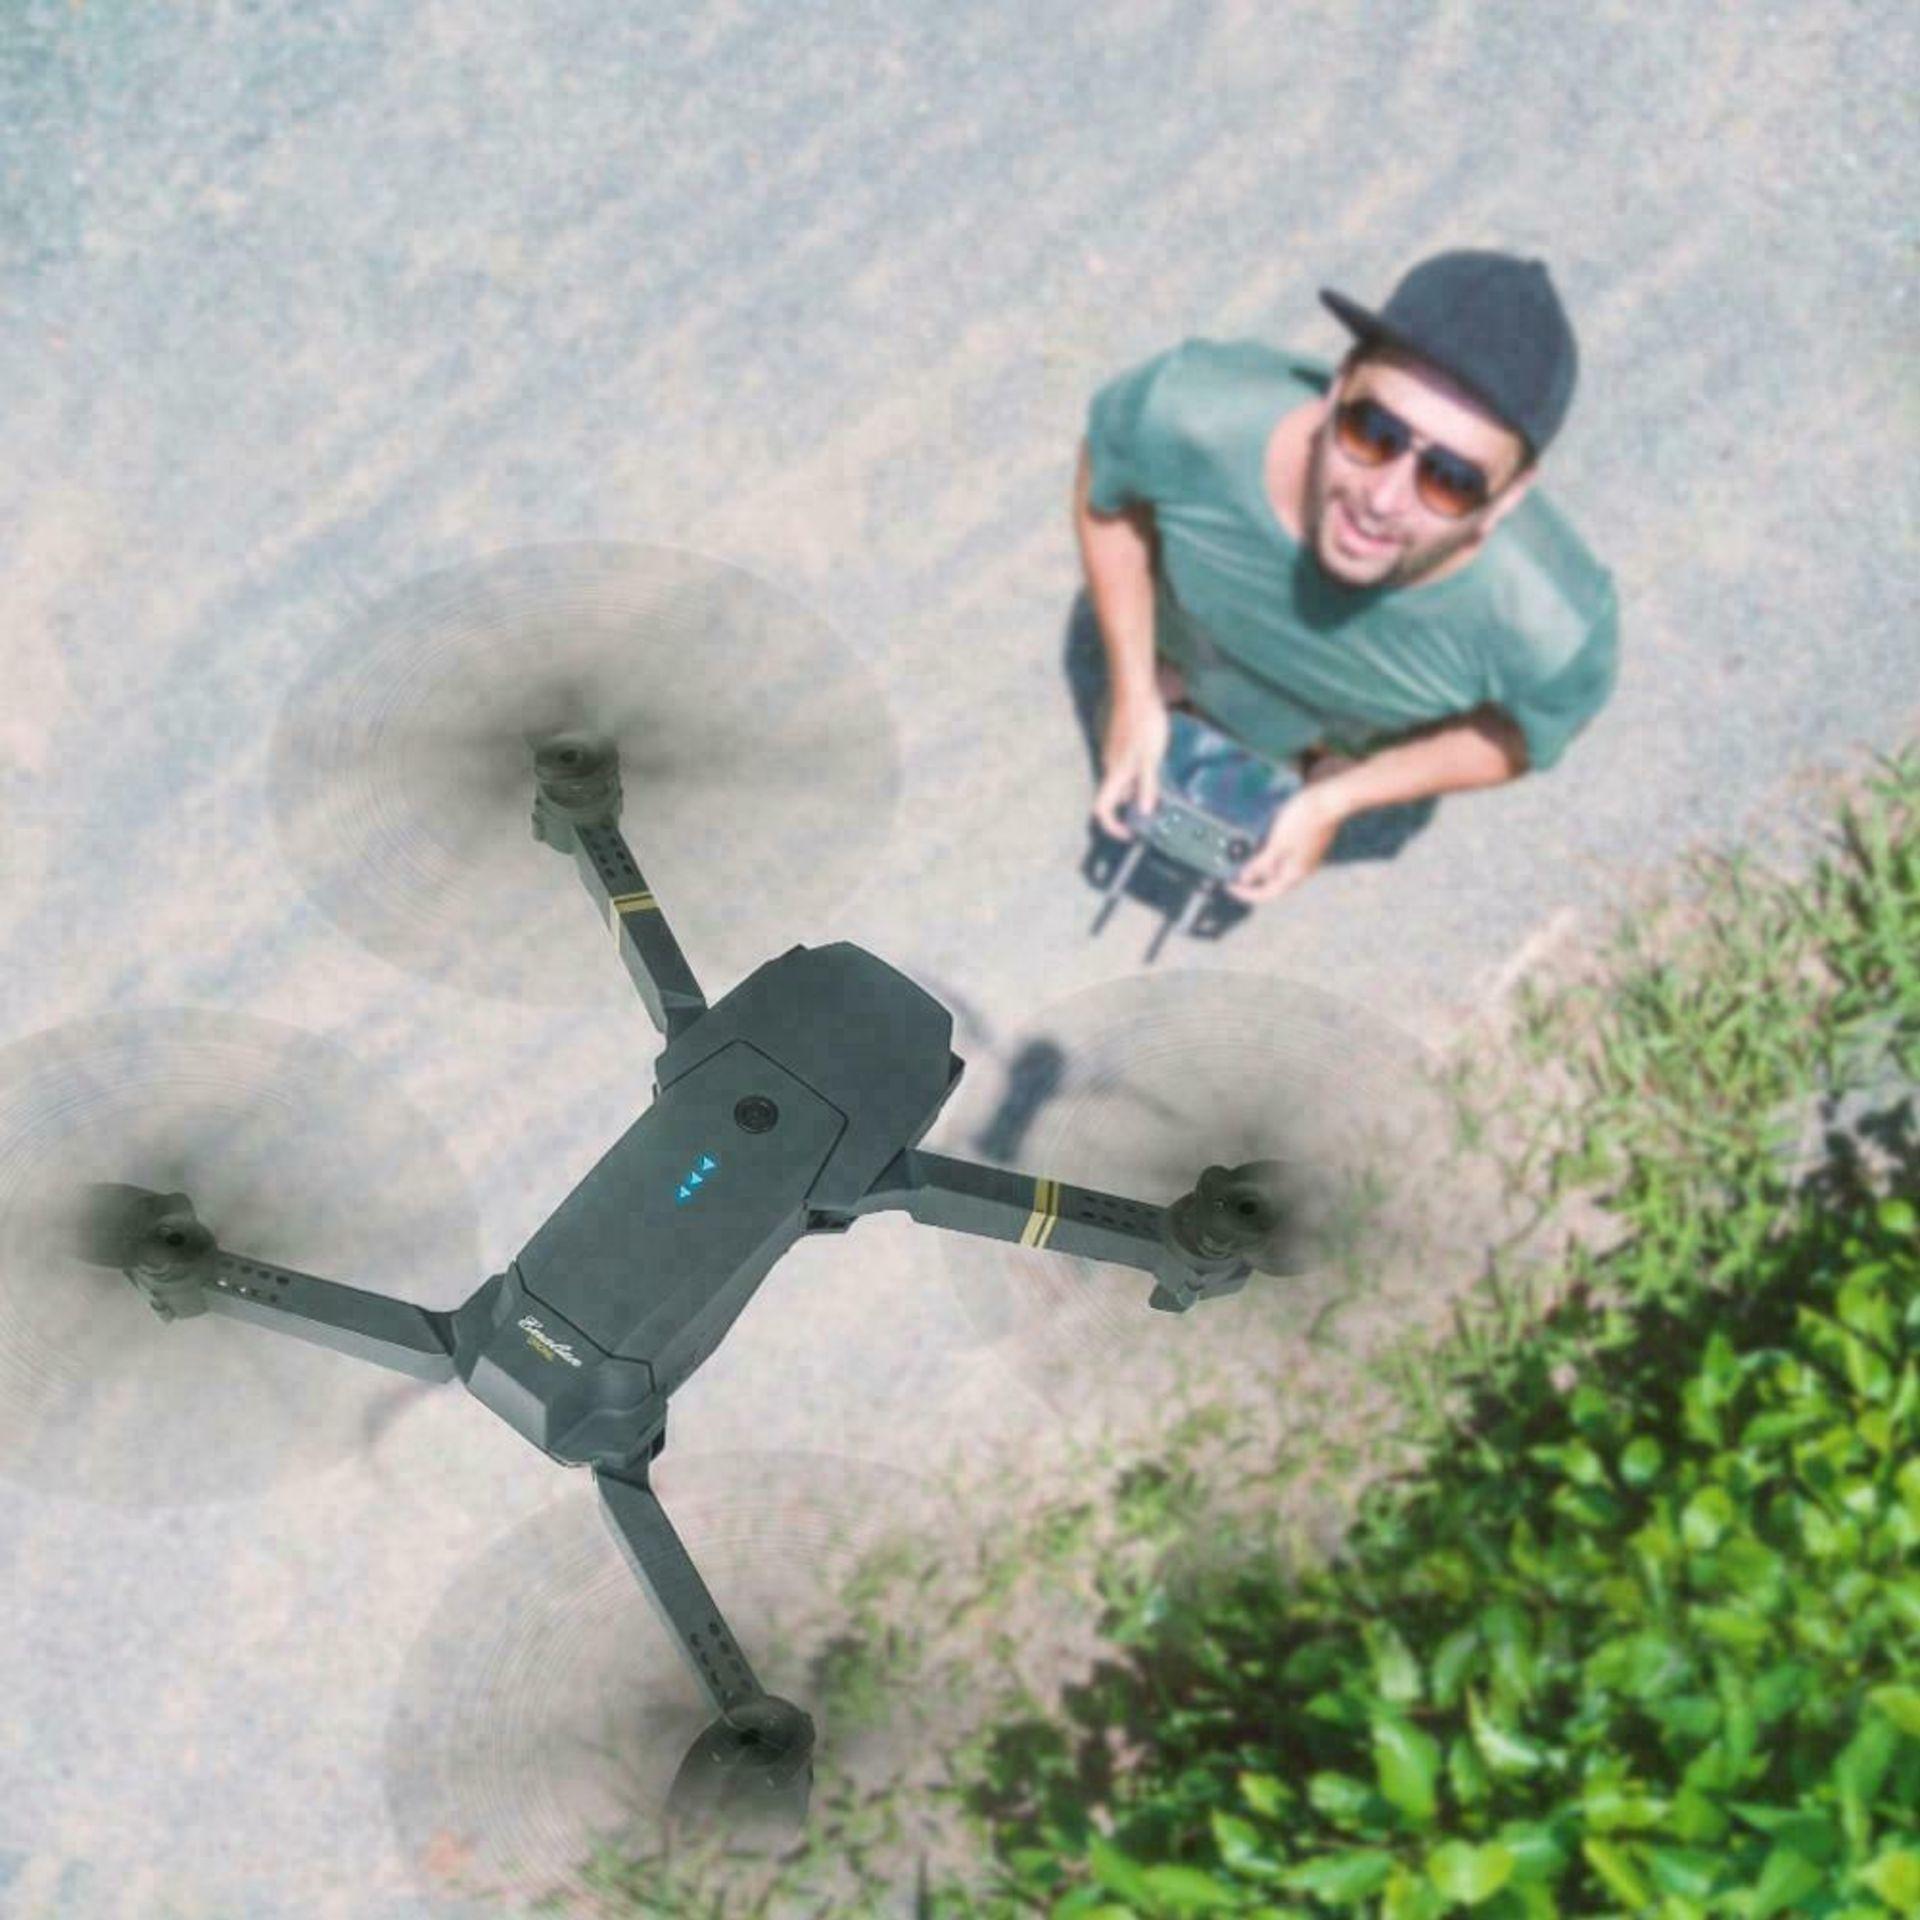 NEW & UNUSED DRONE X PRO WIFI FPV 1080P HD CAMERA FOLDABLE RC QUADCOPTER + BAG *PLUS VAT* - Image 8 of 9